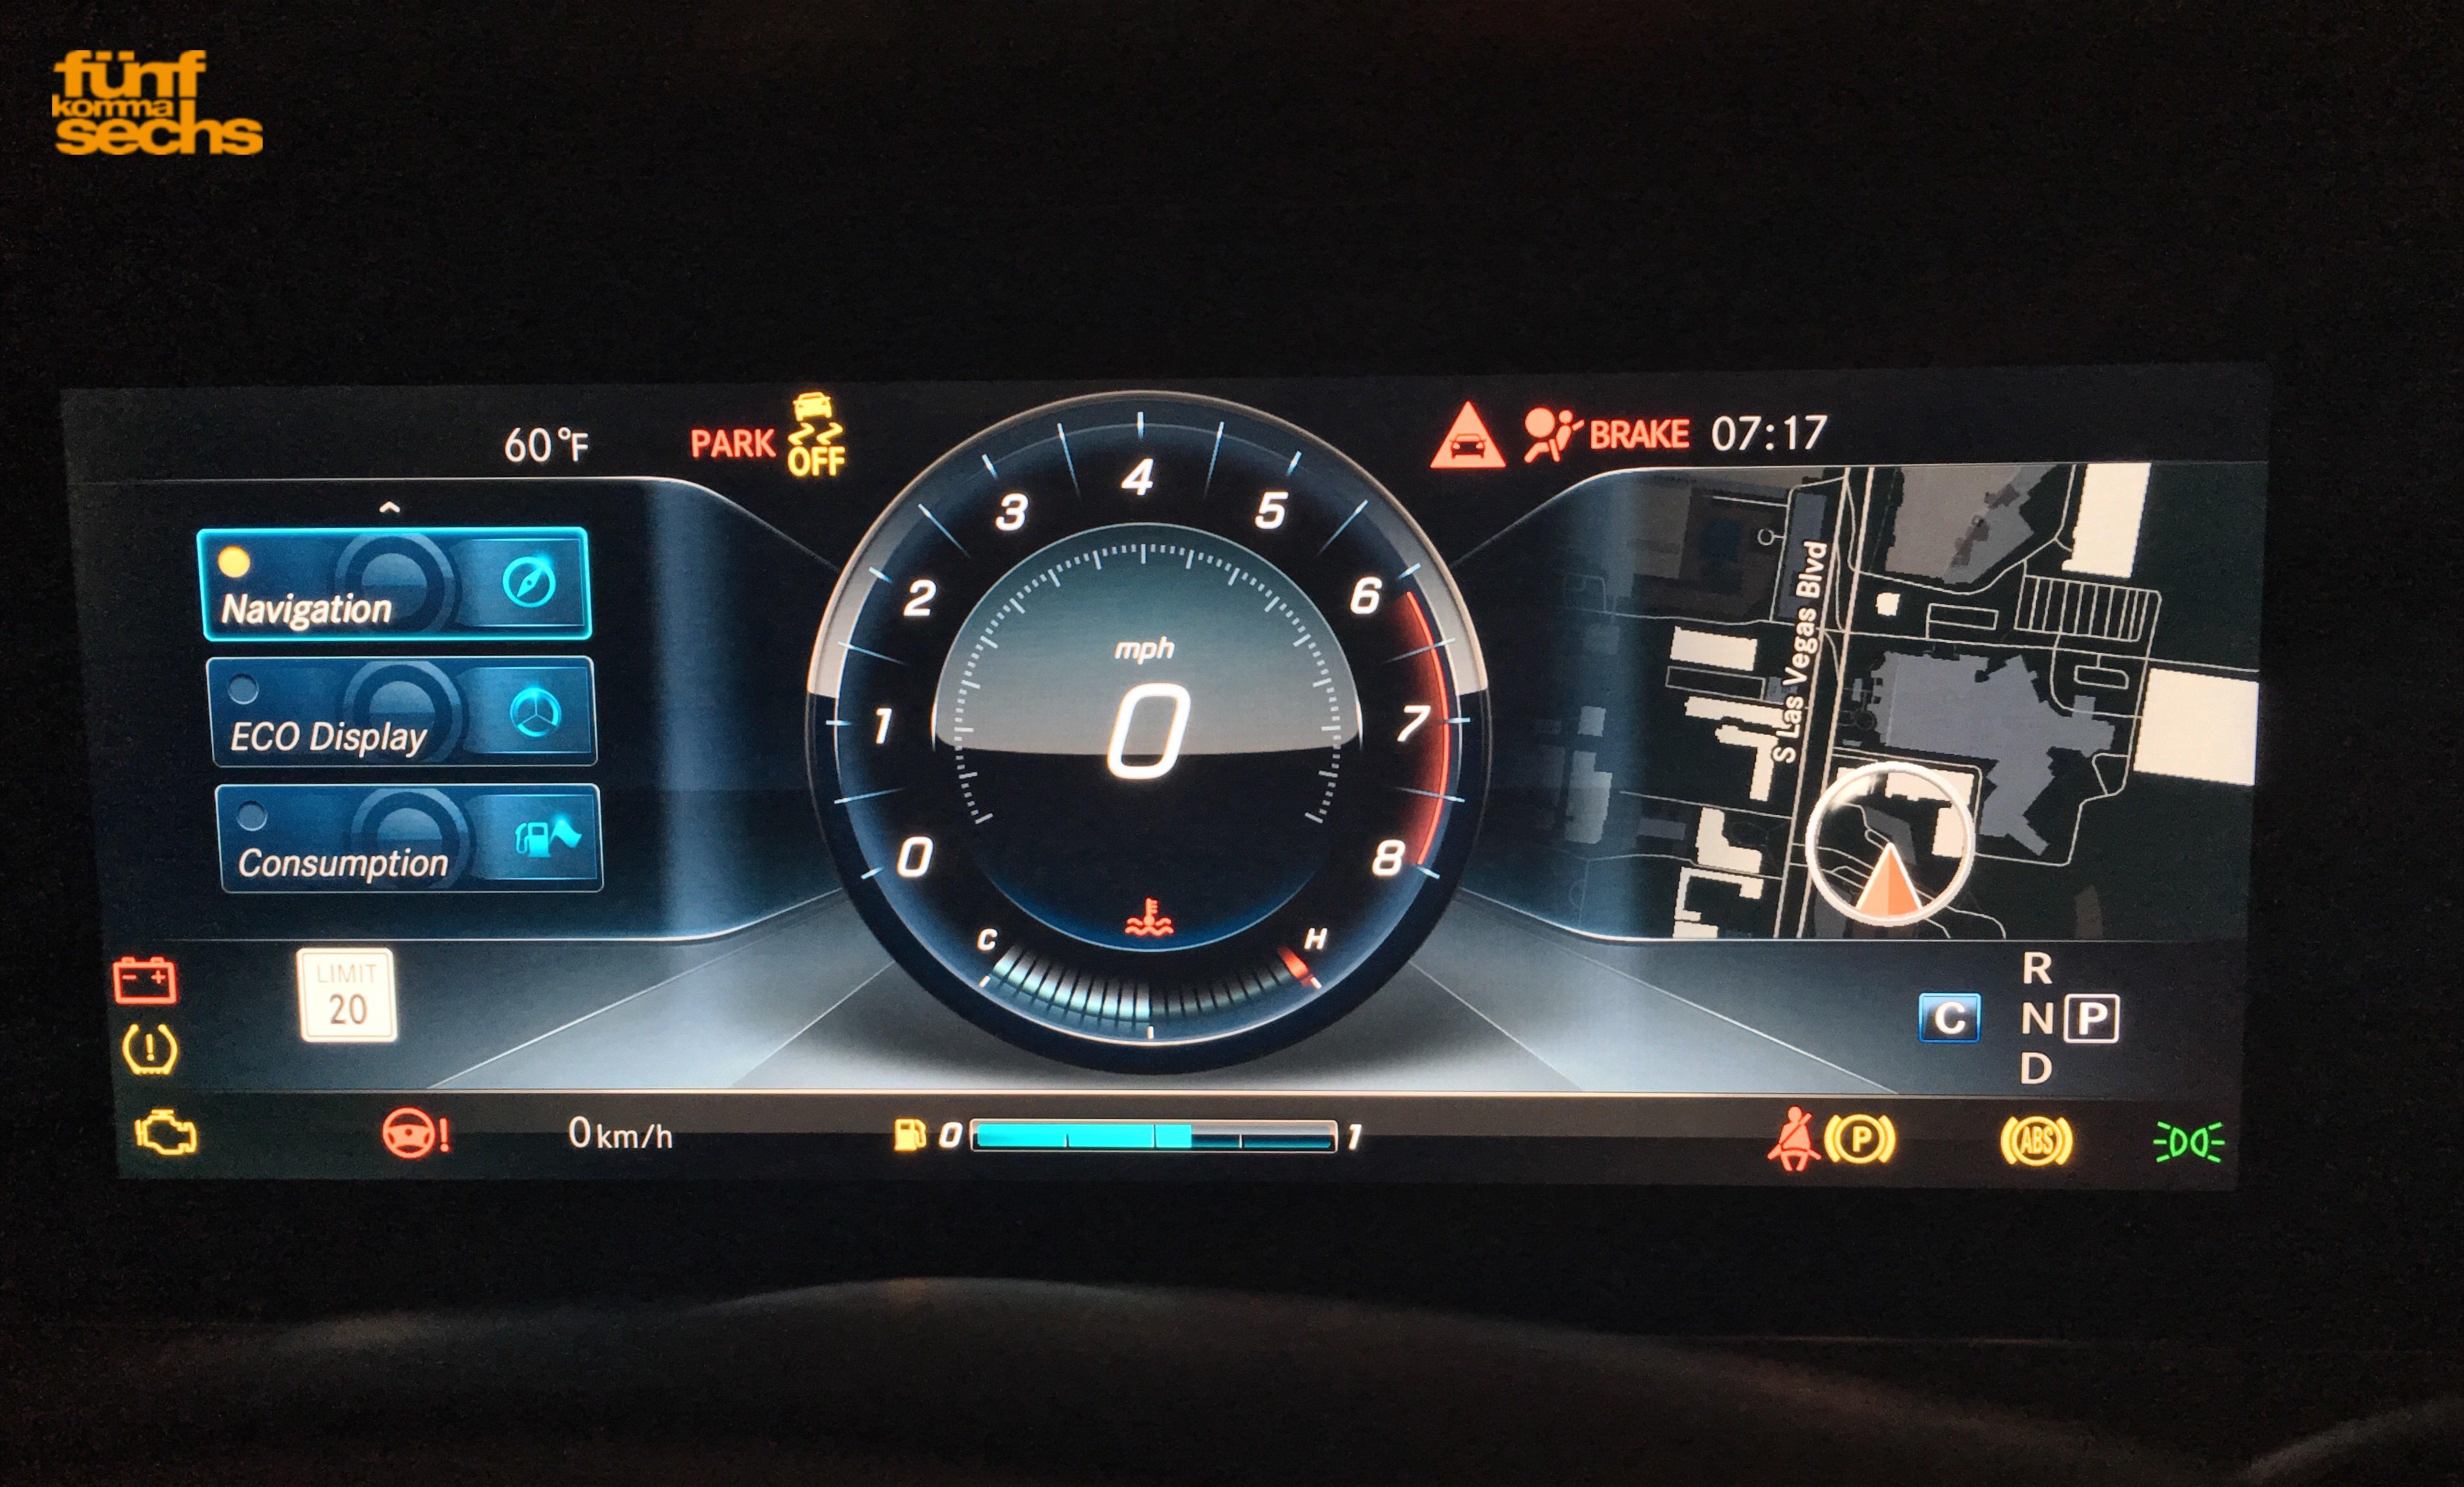 W213 Merc E-Class shows new key fob, display visuals Image ...